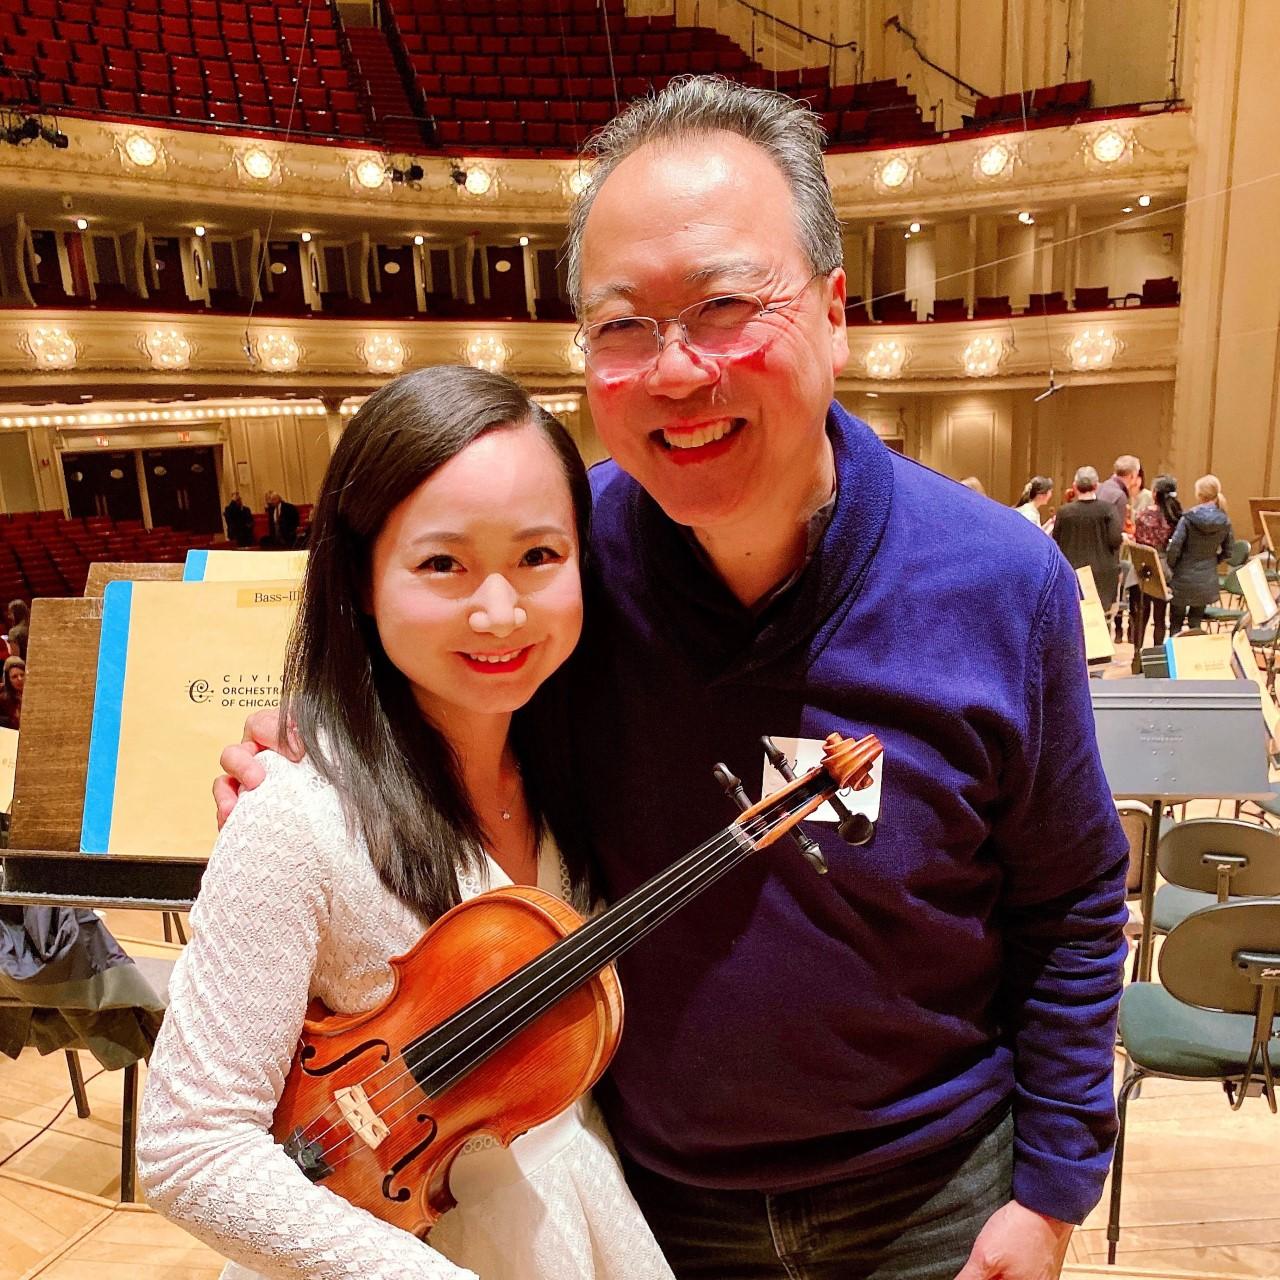 Performing with Yo-Yo Ma at Symphony Center